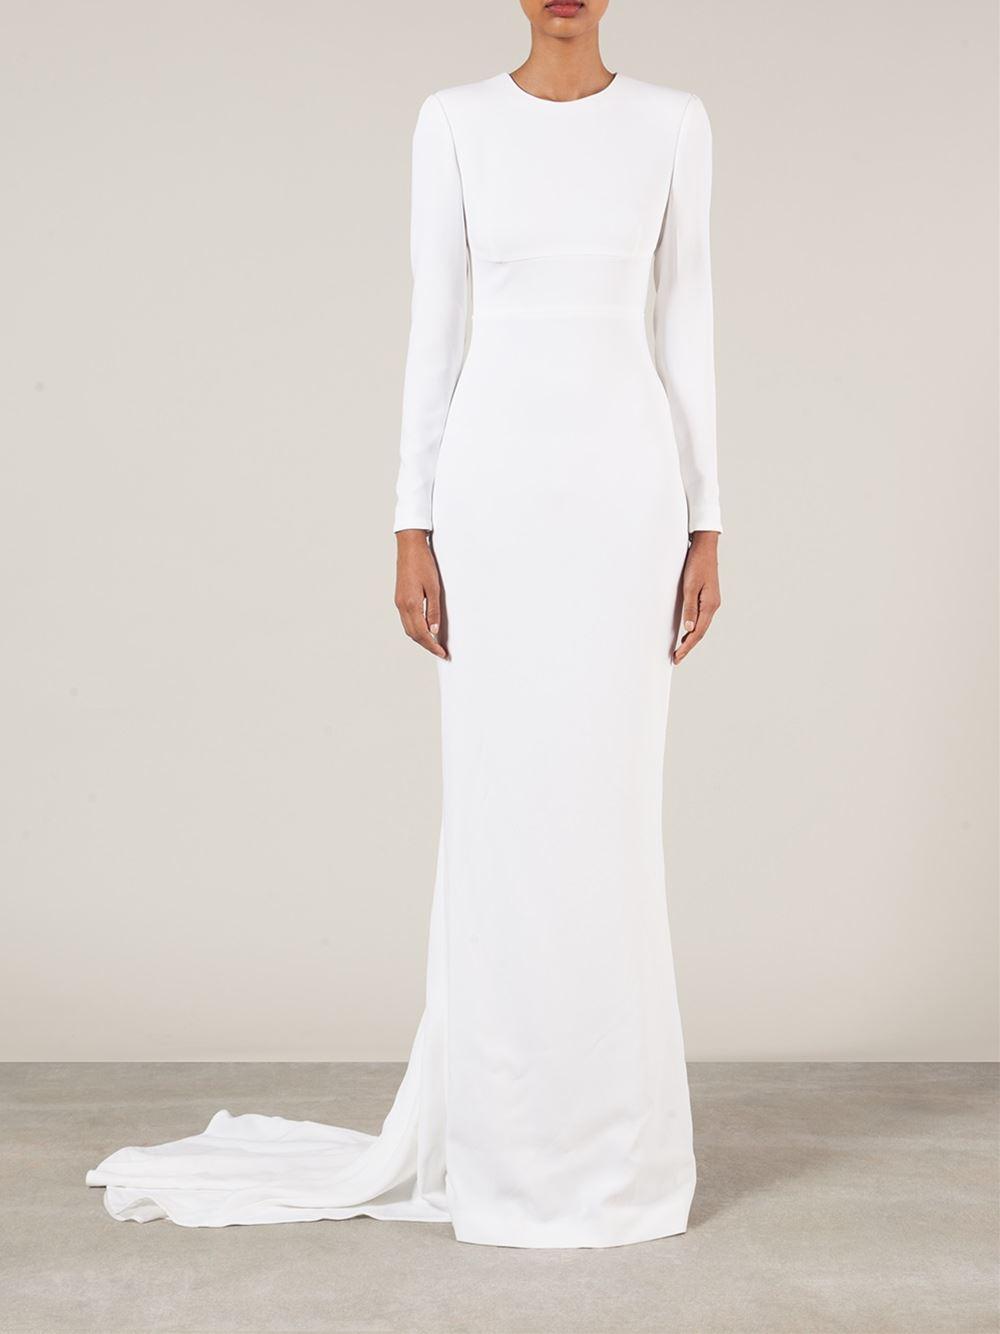 Stella McCartney Wedding Dress